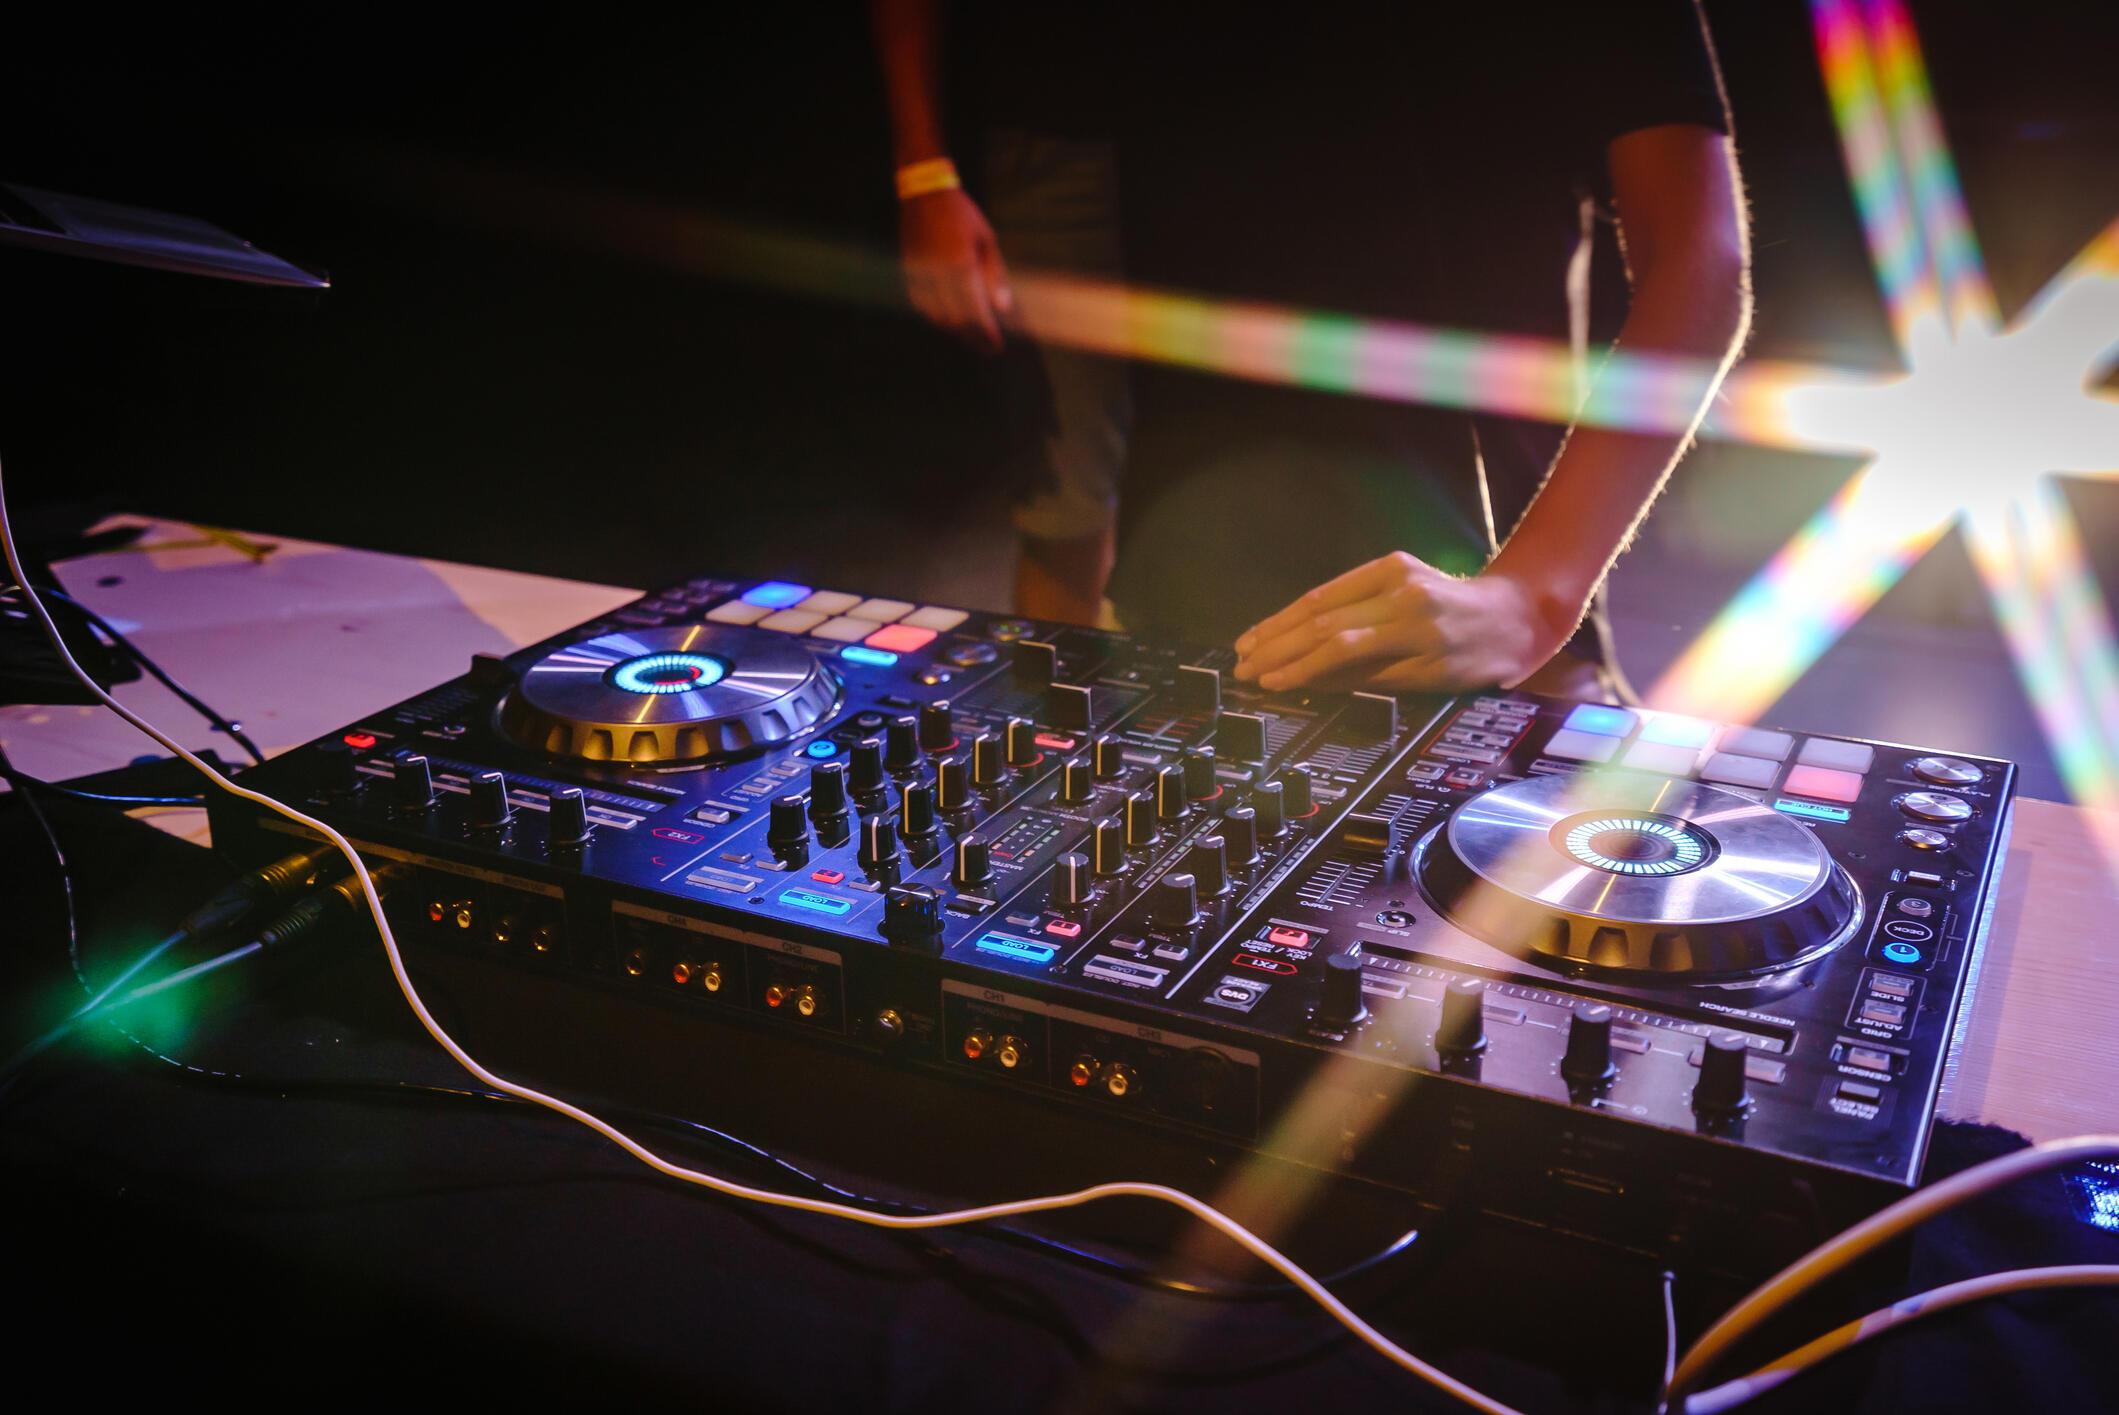 france discothèque boîte de nuit night club